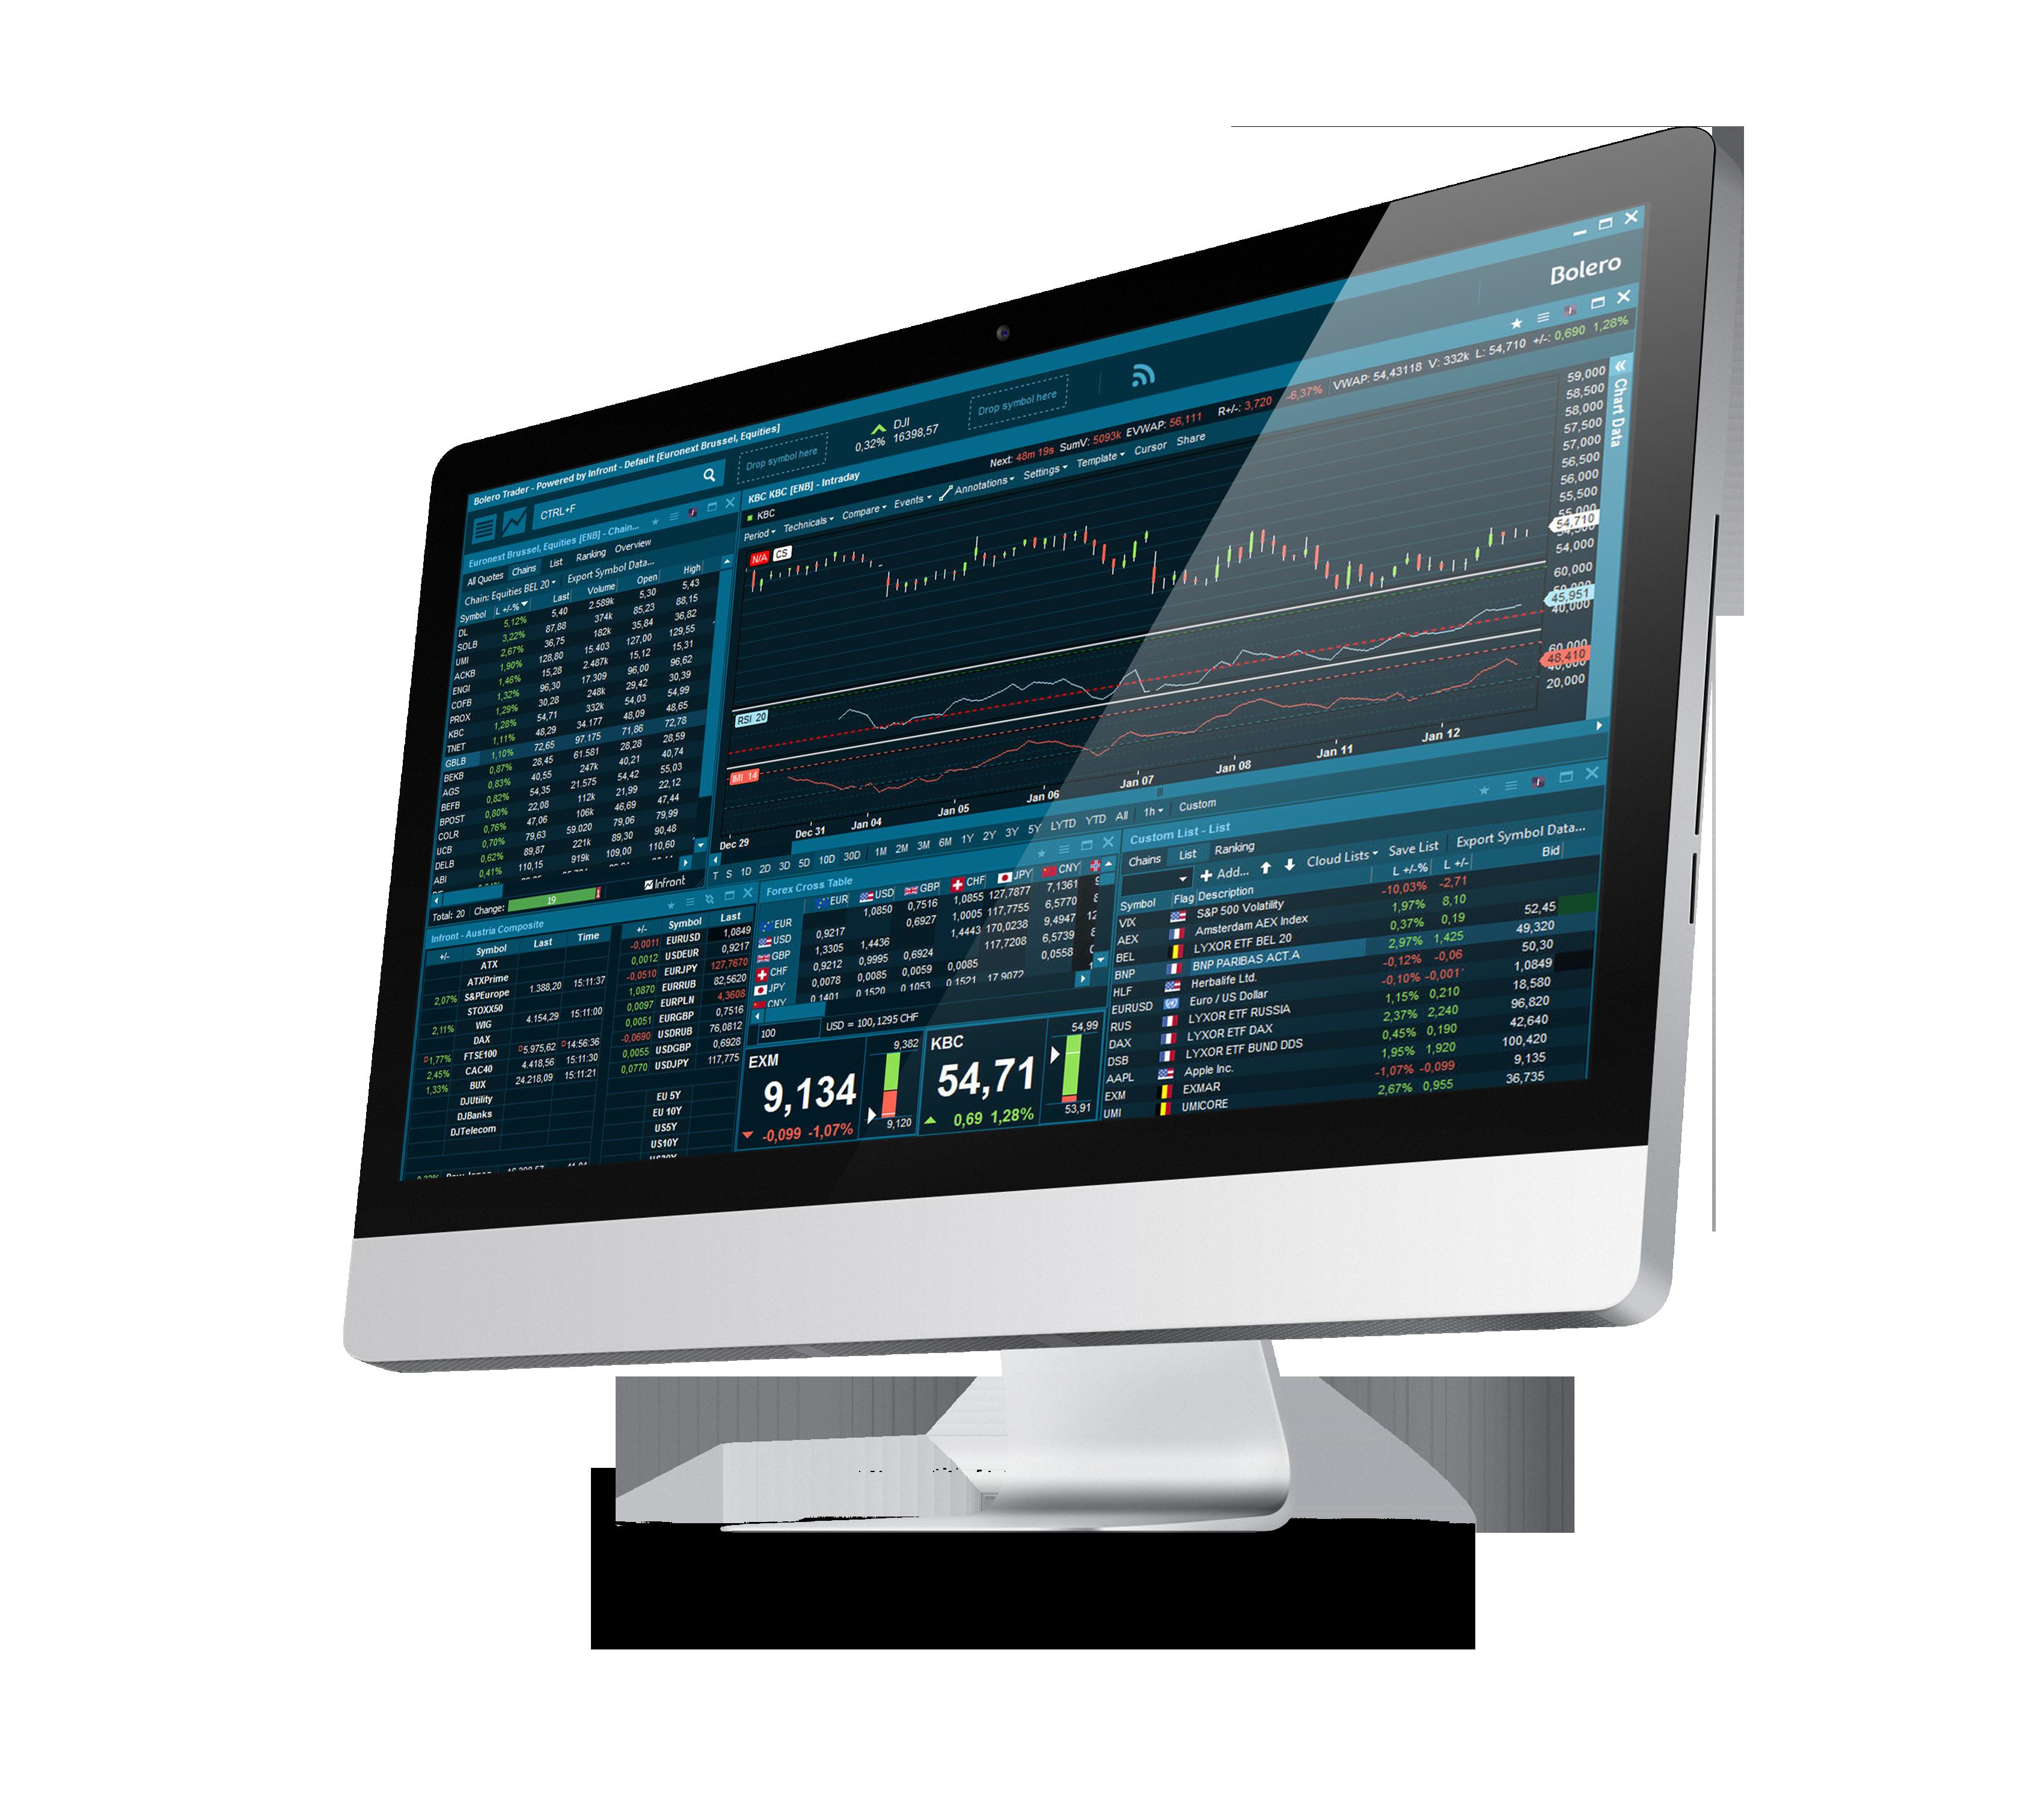 Bolero Trader | Bolero